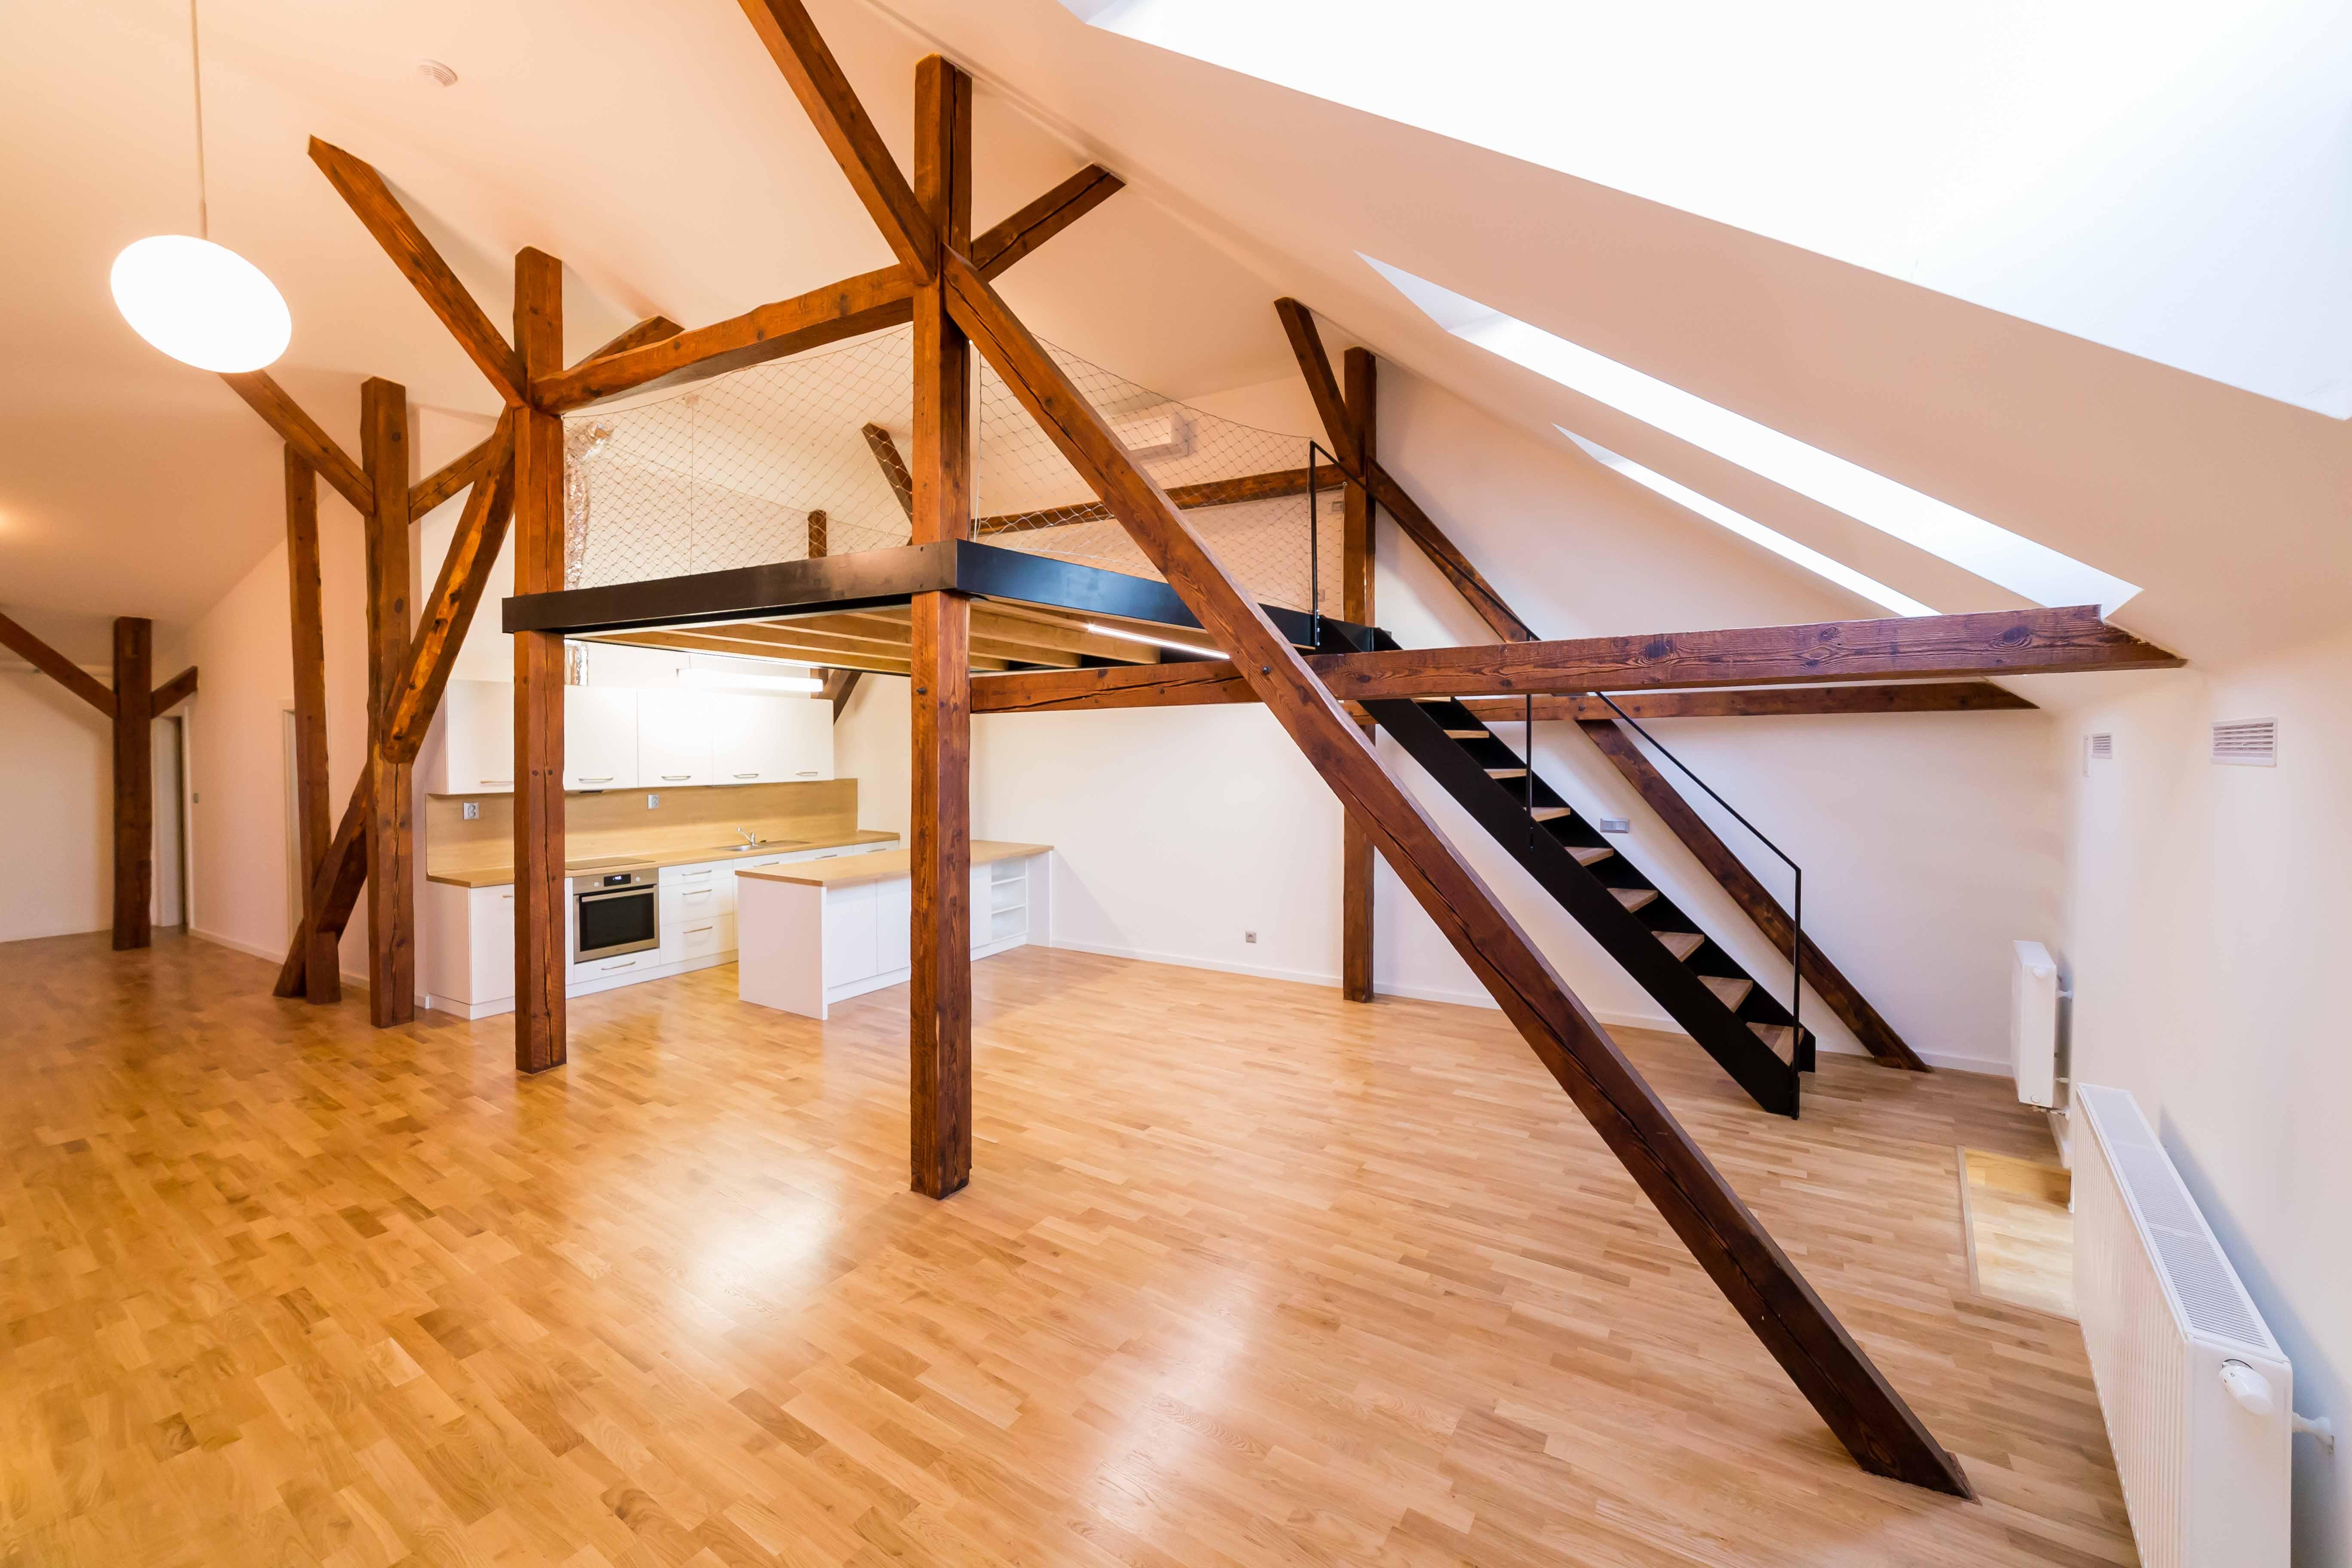 tram svetlo podlaha drevo radiator schodiste kuchyn stresni okna reality opava linda bittova